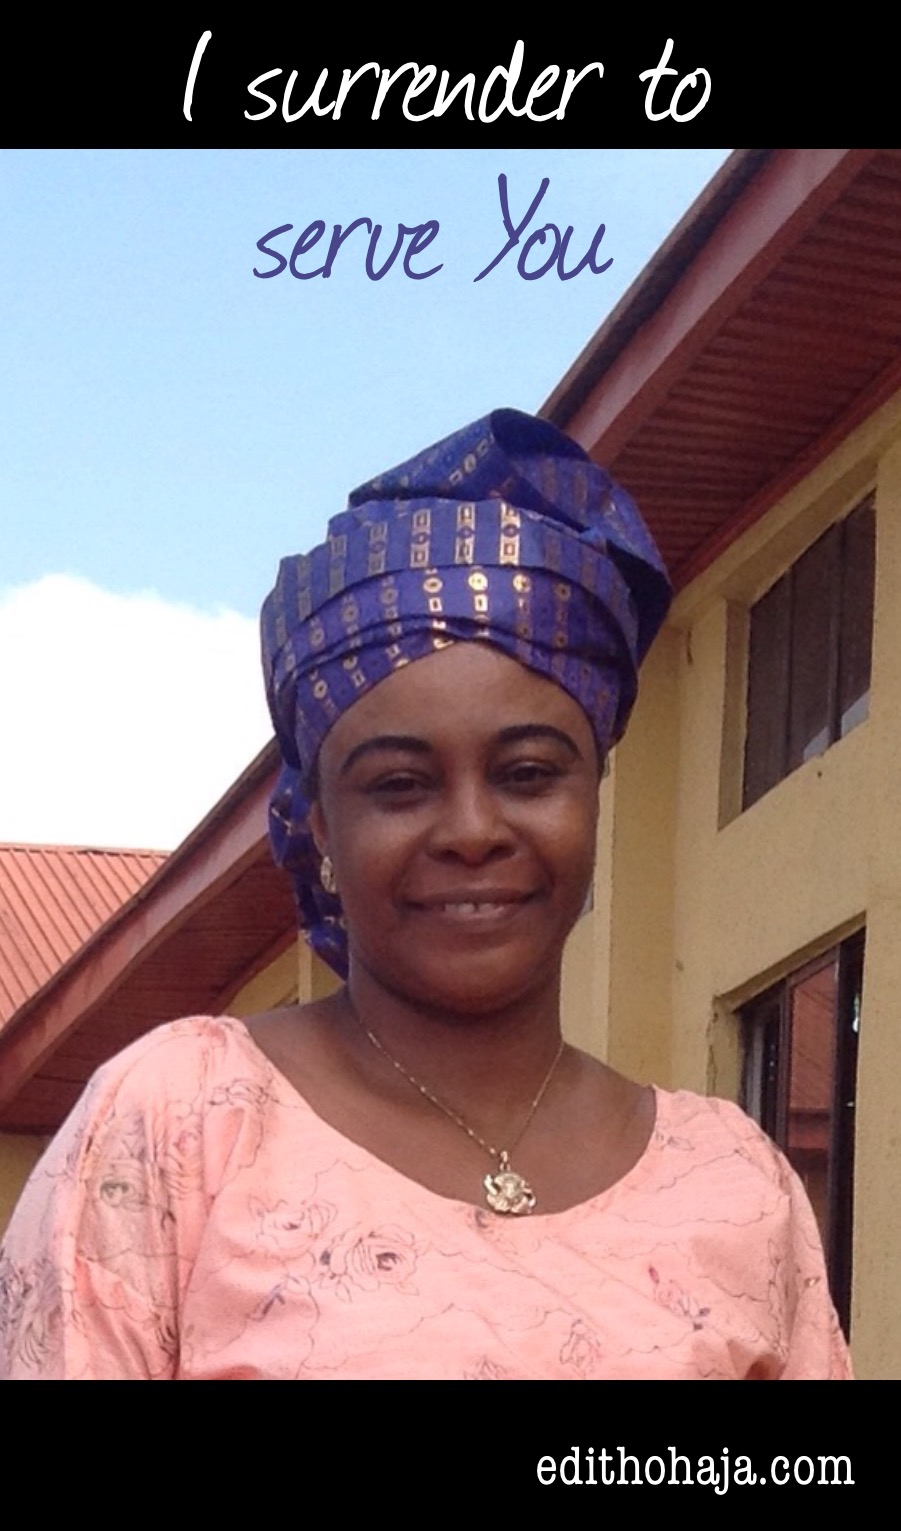 A BIRTHDAY PRAYER: I SURRENDER TO SERVE YOU